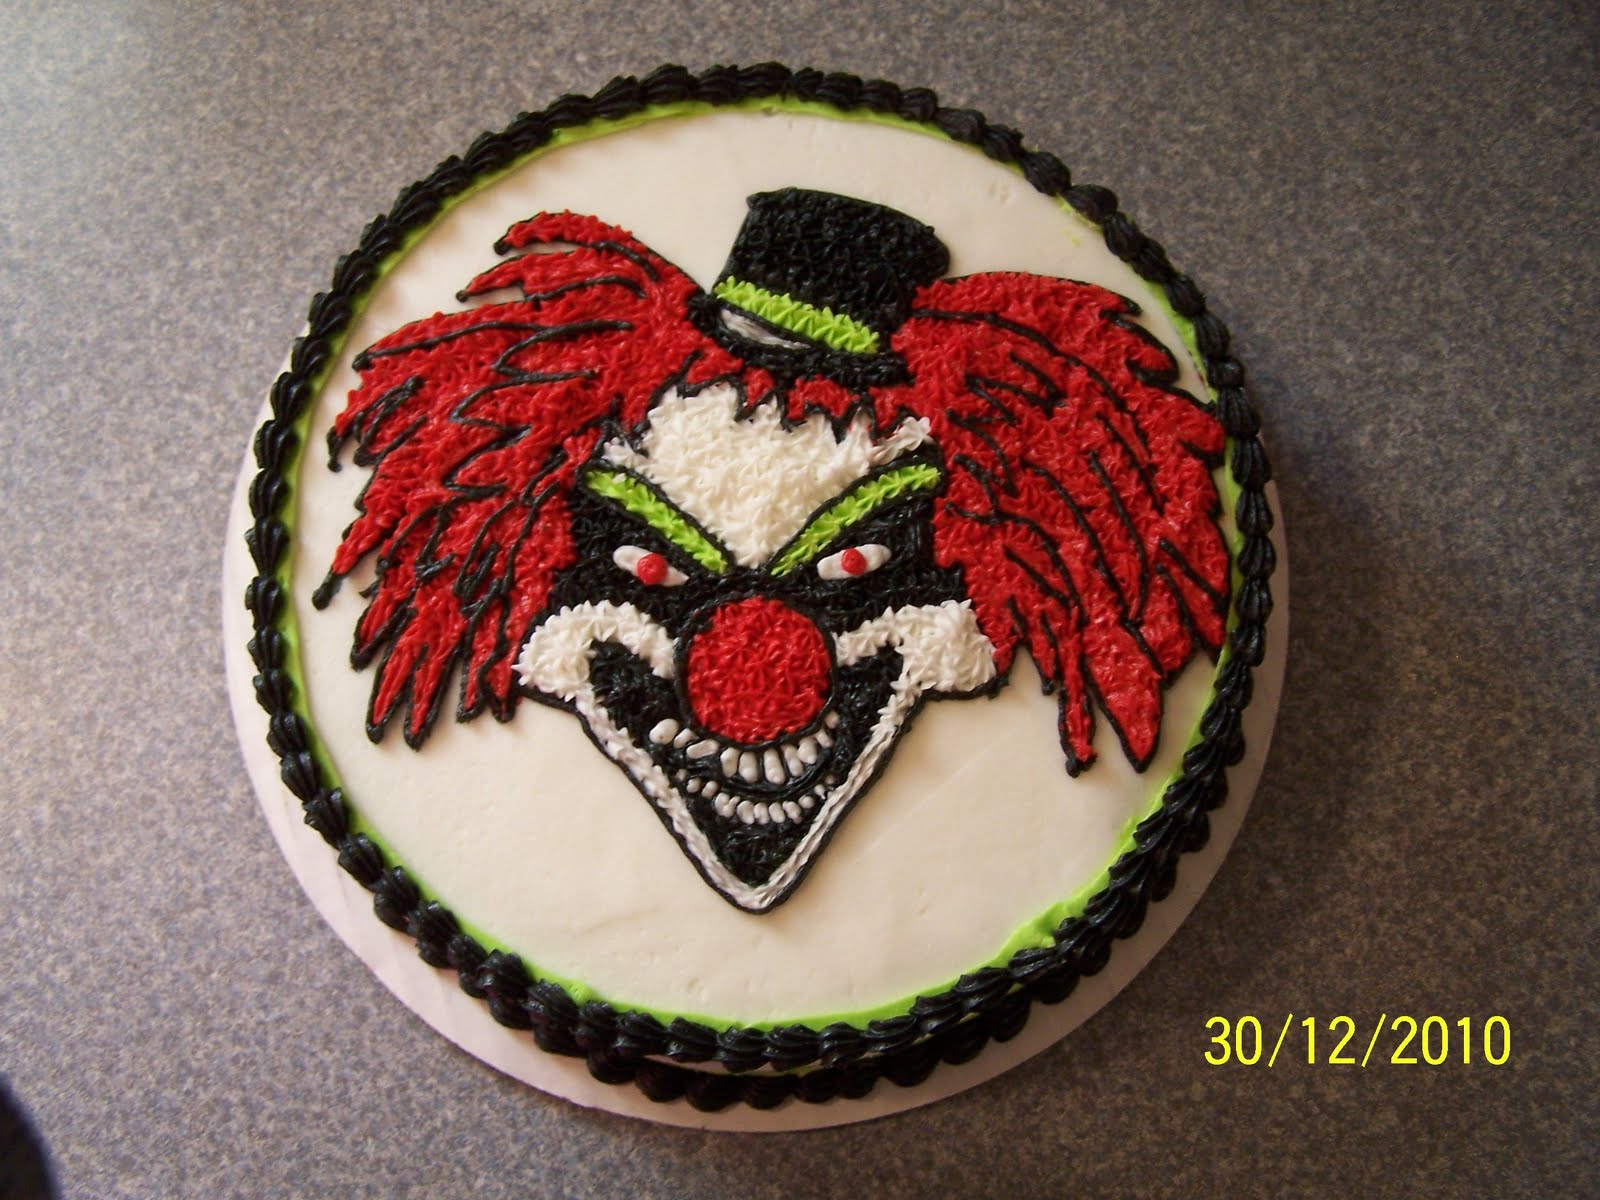 Edees Custom Cakes Clown Cake